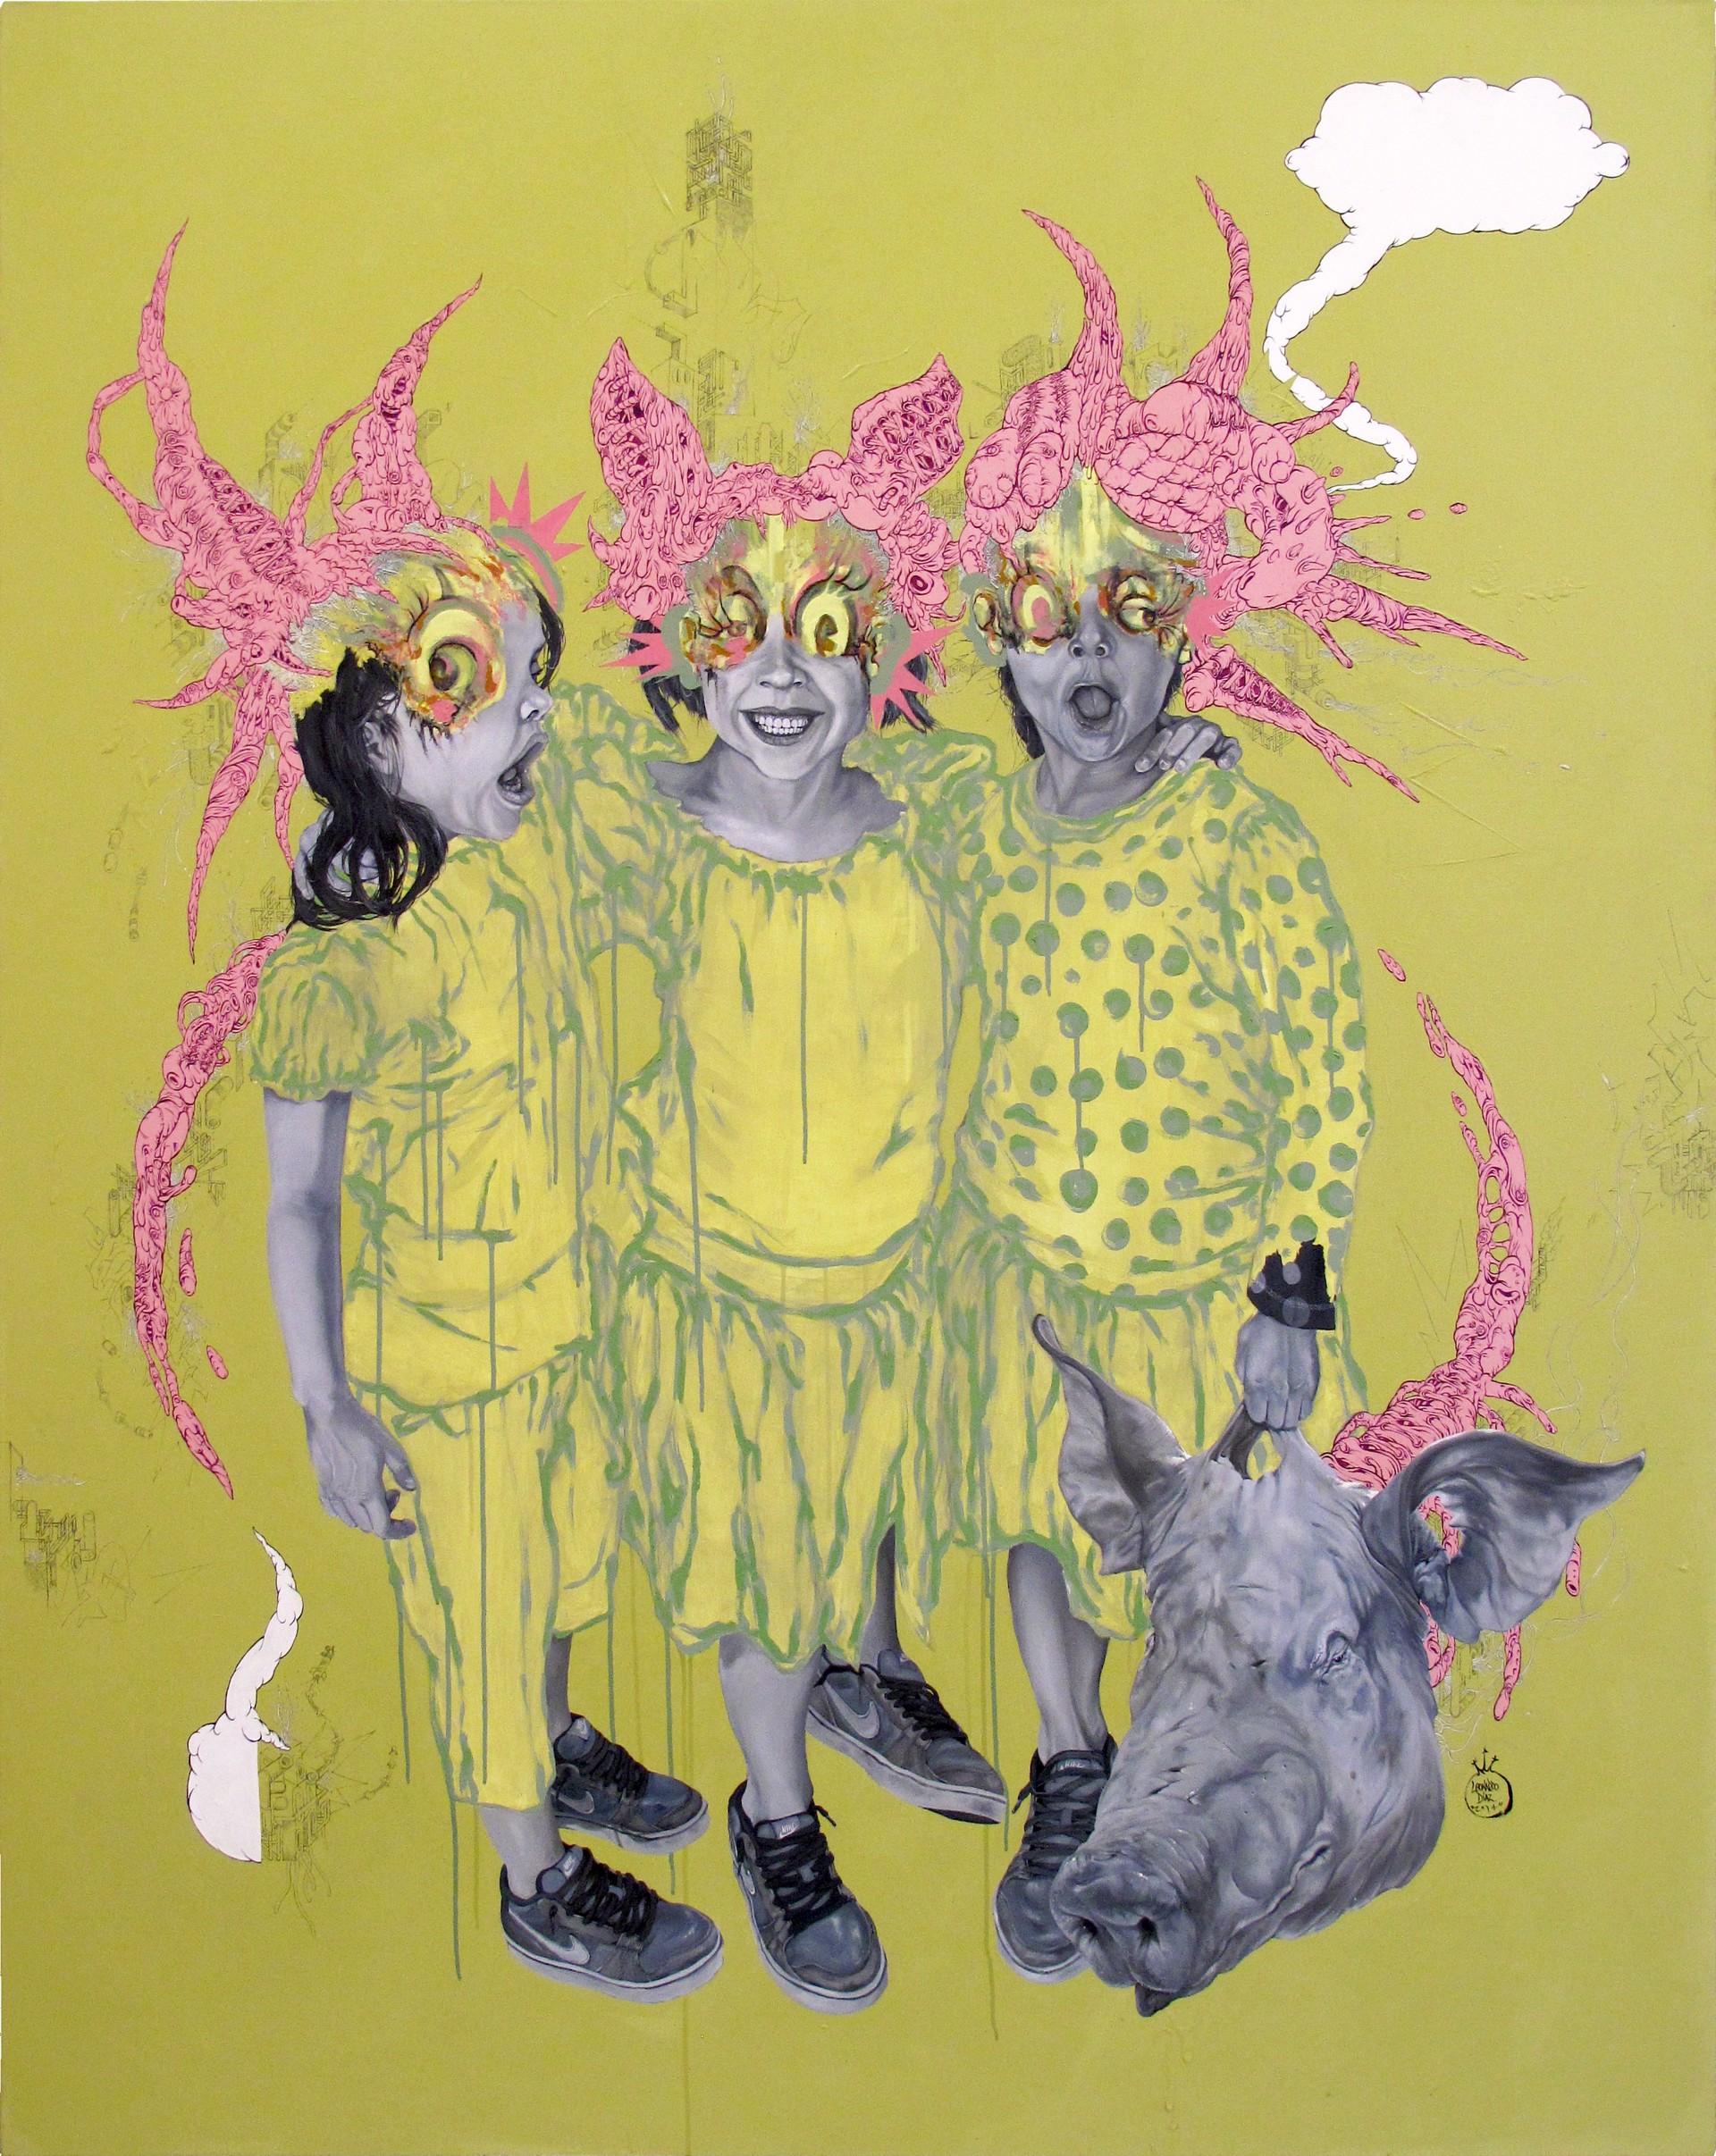 Flesh Androids by Leonardo Diaz